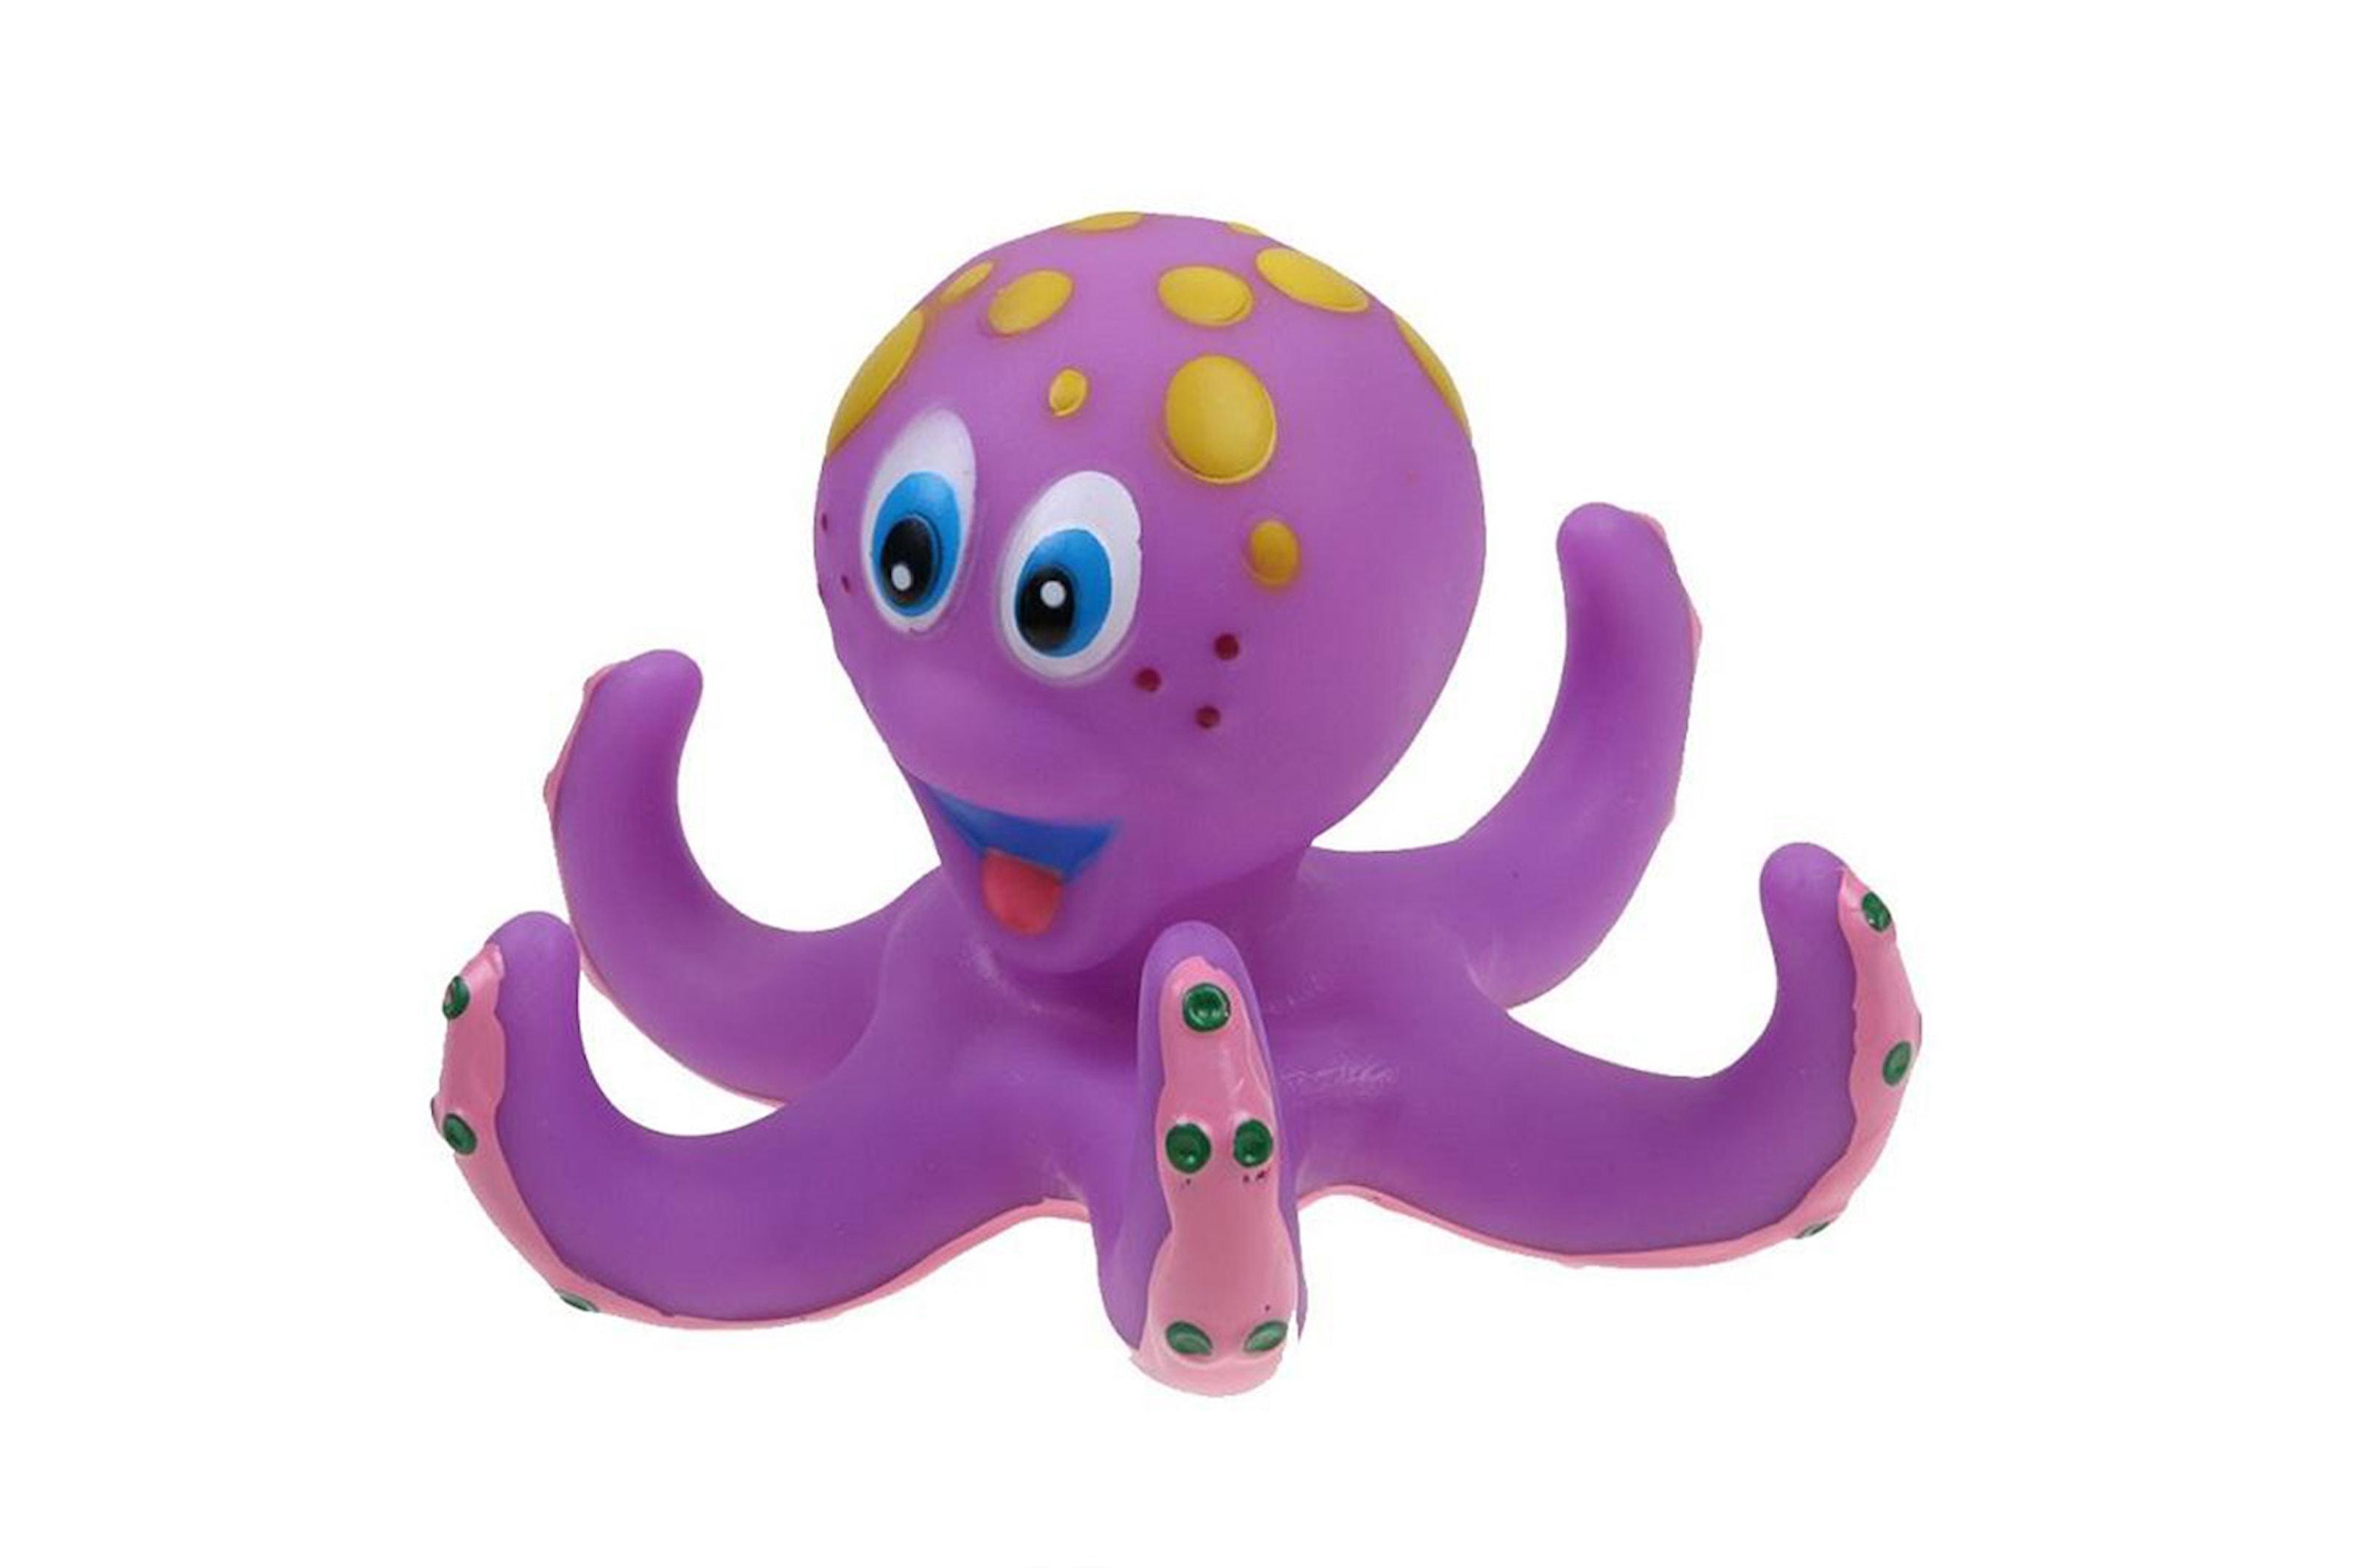 Flytende blekksprut